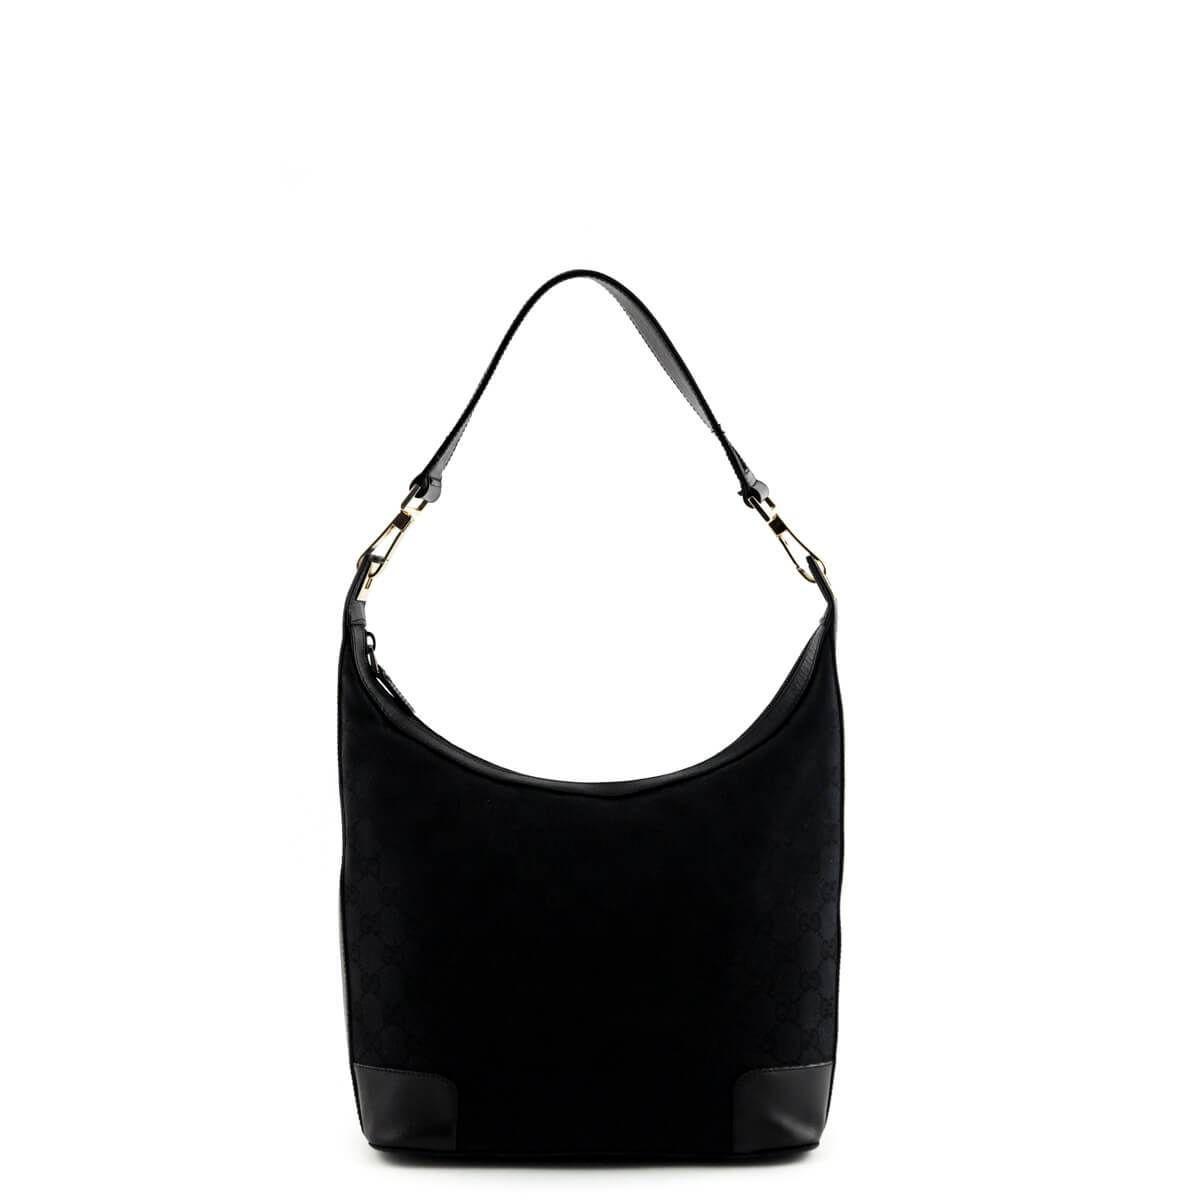 Gucci Black Monogram Canvas Shoulder Bag 250cad Canvas Shoulder Bag Gucci Black Bags